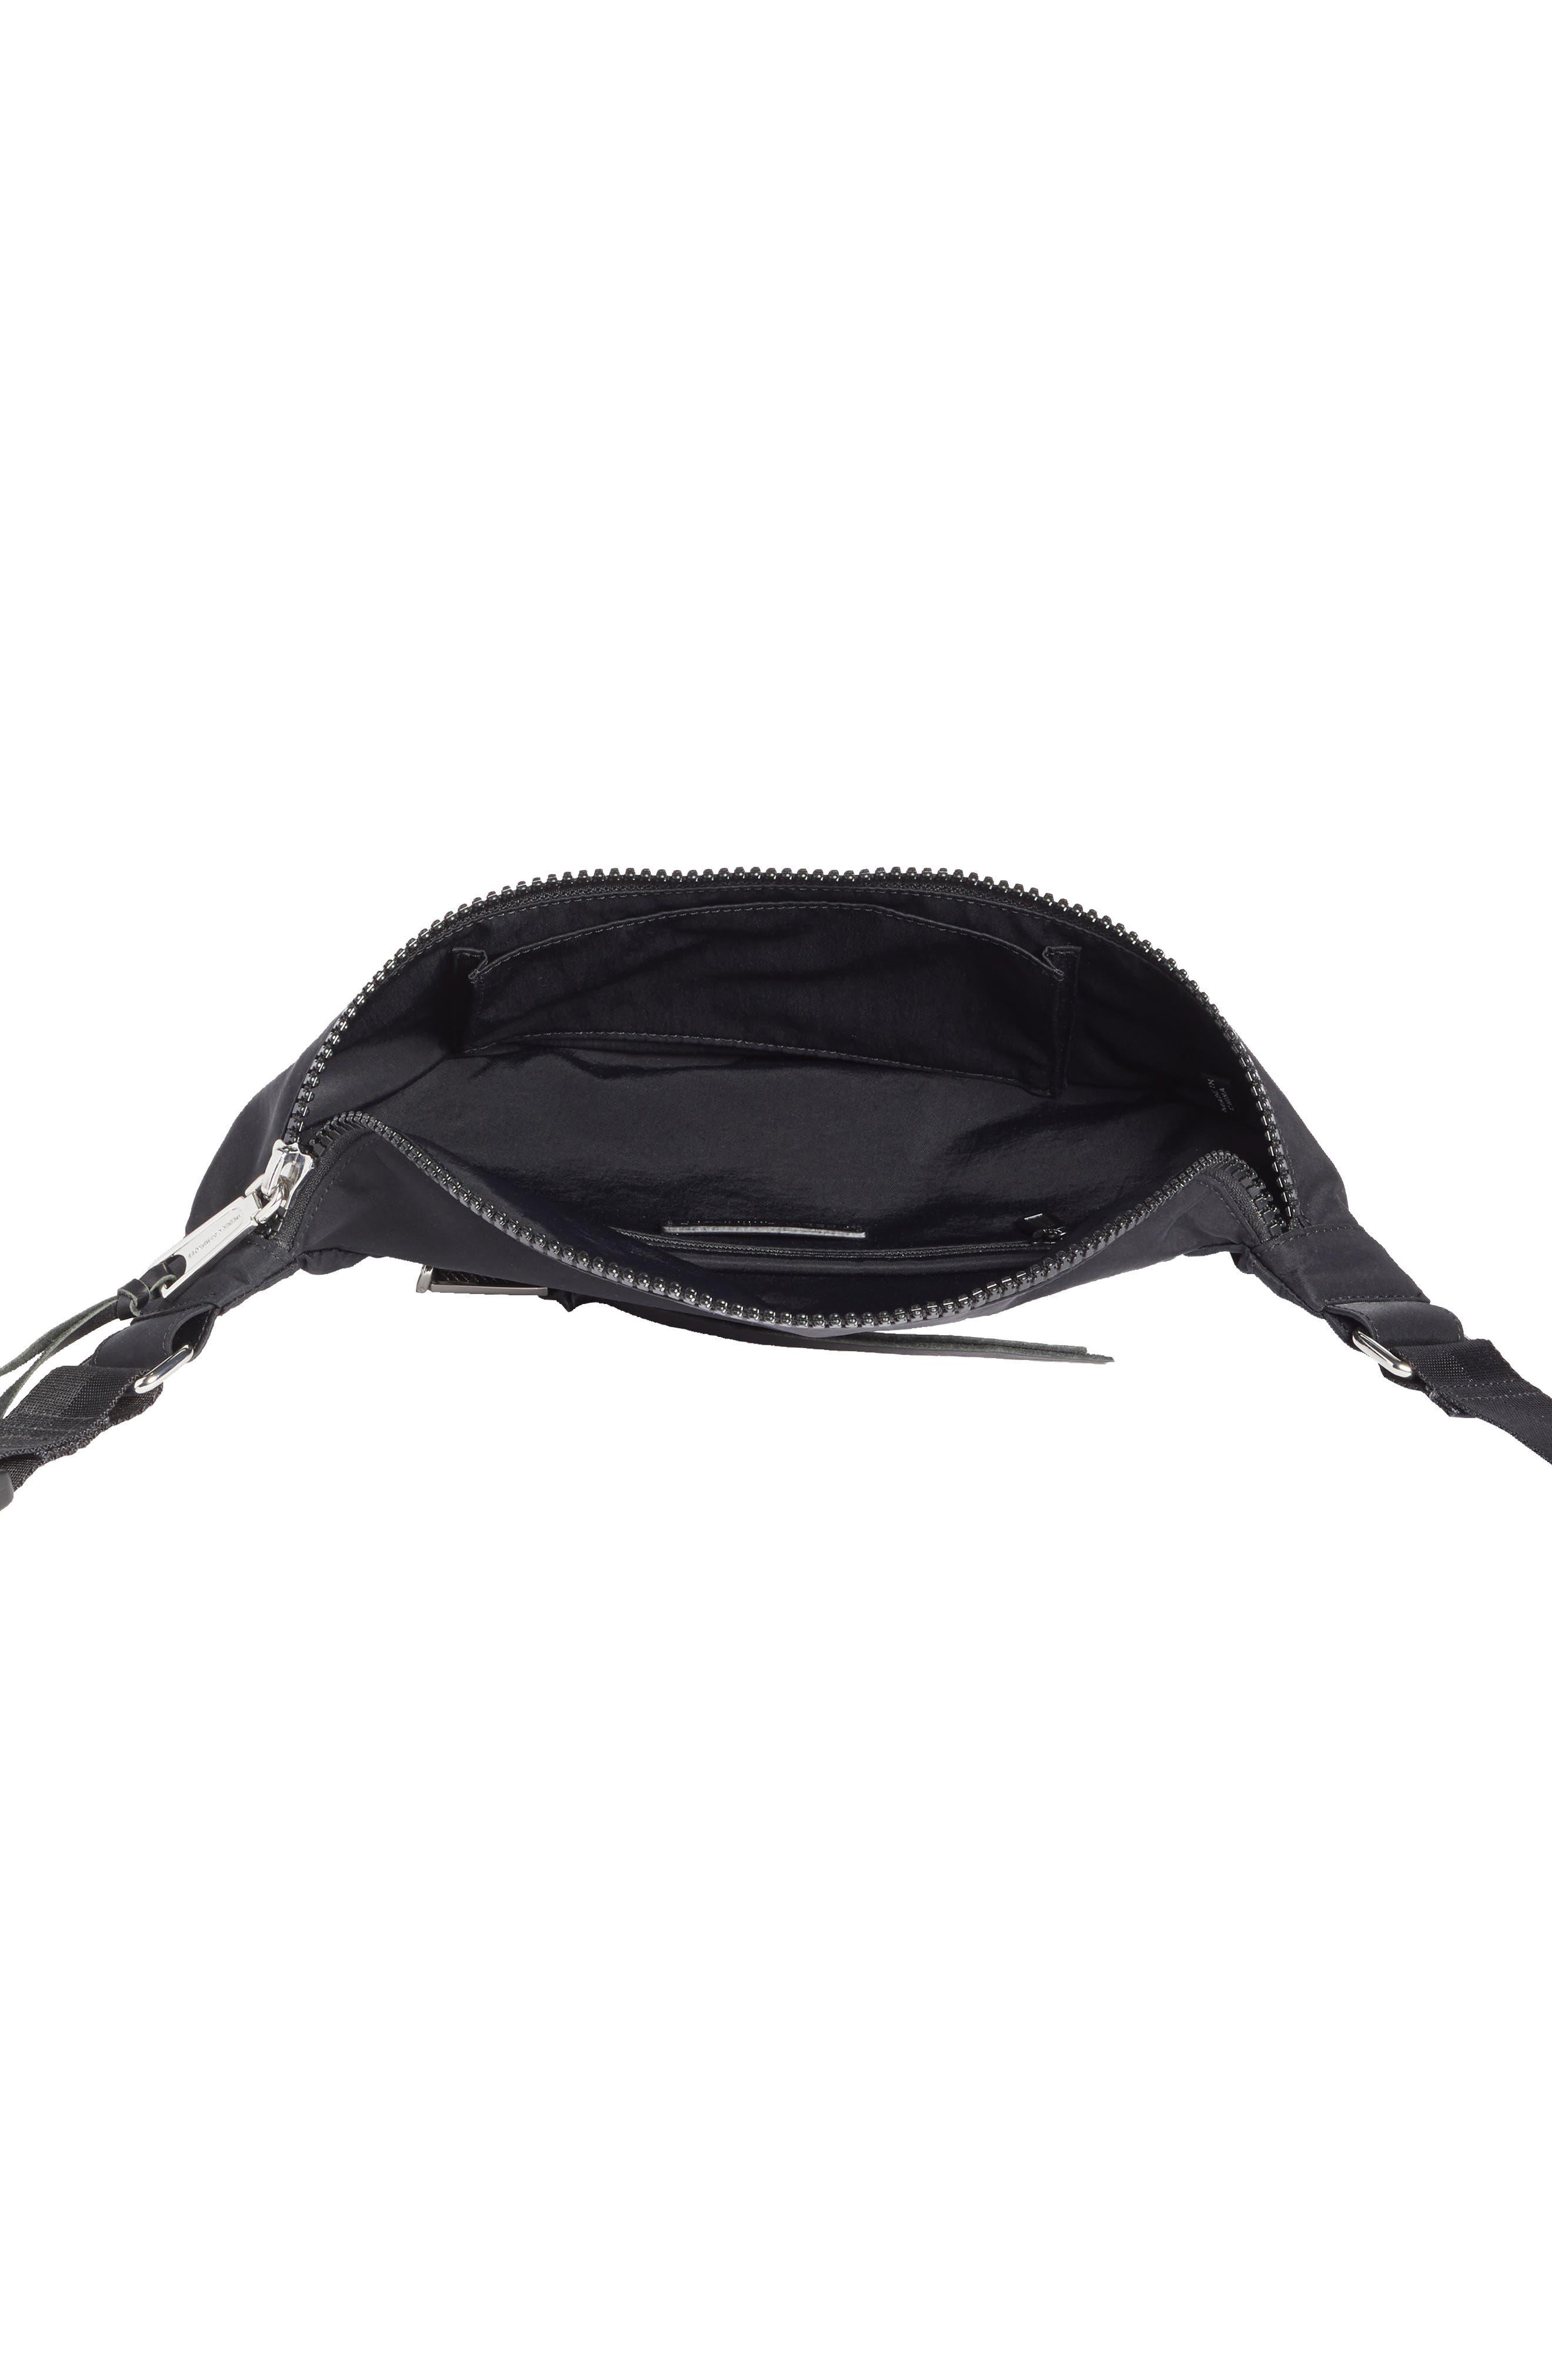 REBECCA MINKOFF, Nylon Belt Bag, Alternate thumbnail 5, color, BLACK